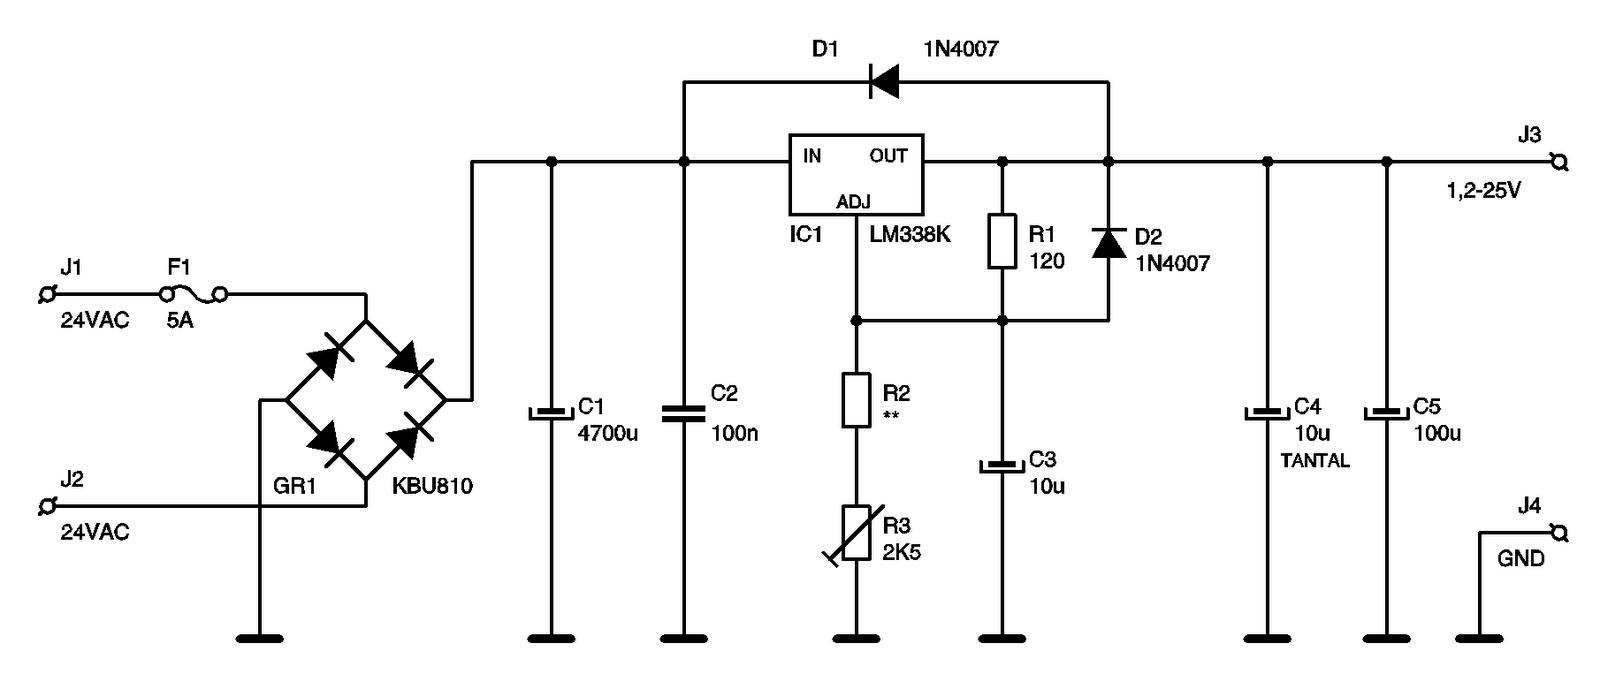 Car Amplifier Power Supply Circuit Diagram Amplifiercircuit Seekiccom Elektronik Design